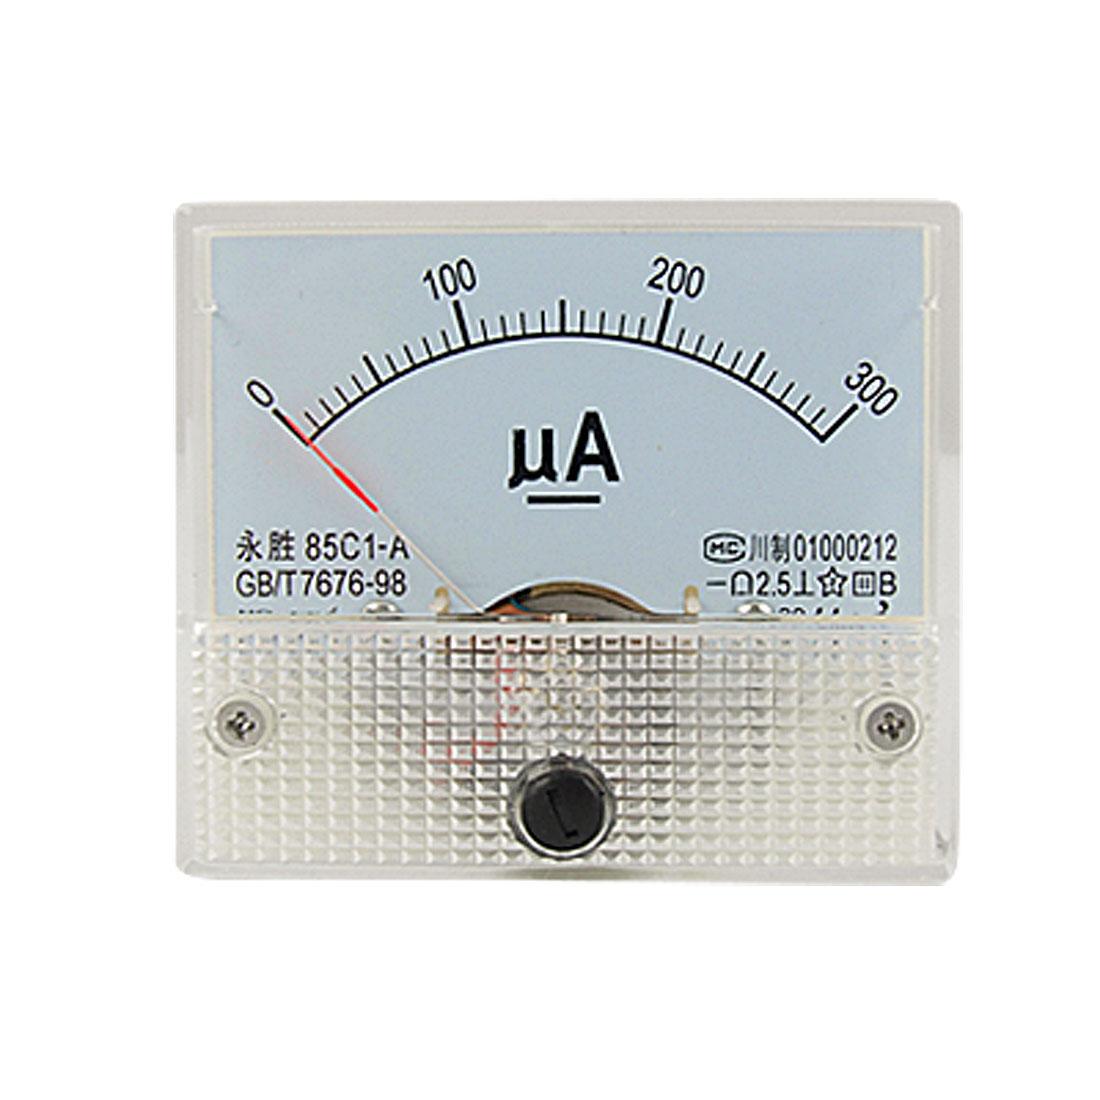 85C1-A DC 0-300uA Analog Panel Meter Ammeter Gauge